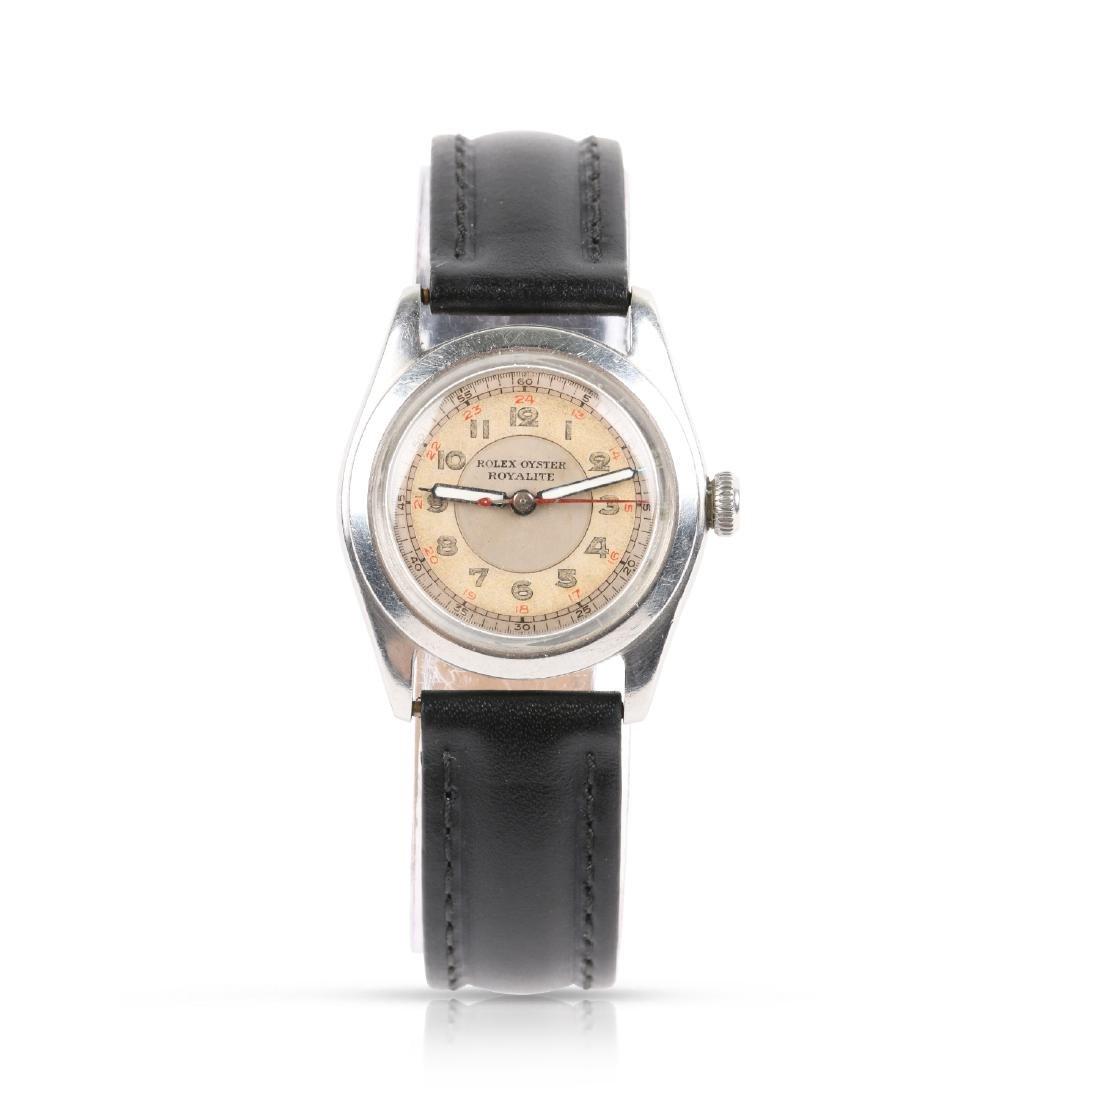 "Rolex Oyster, WWII-Era ""Royalite"""